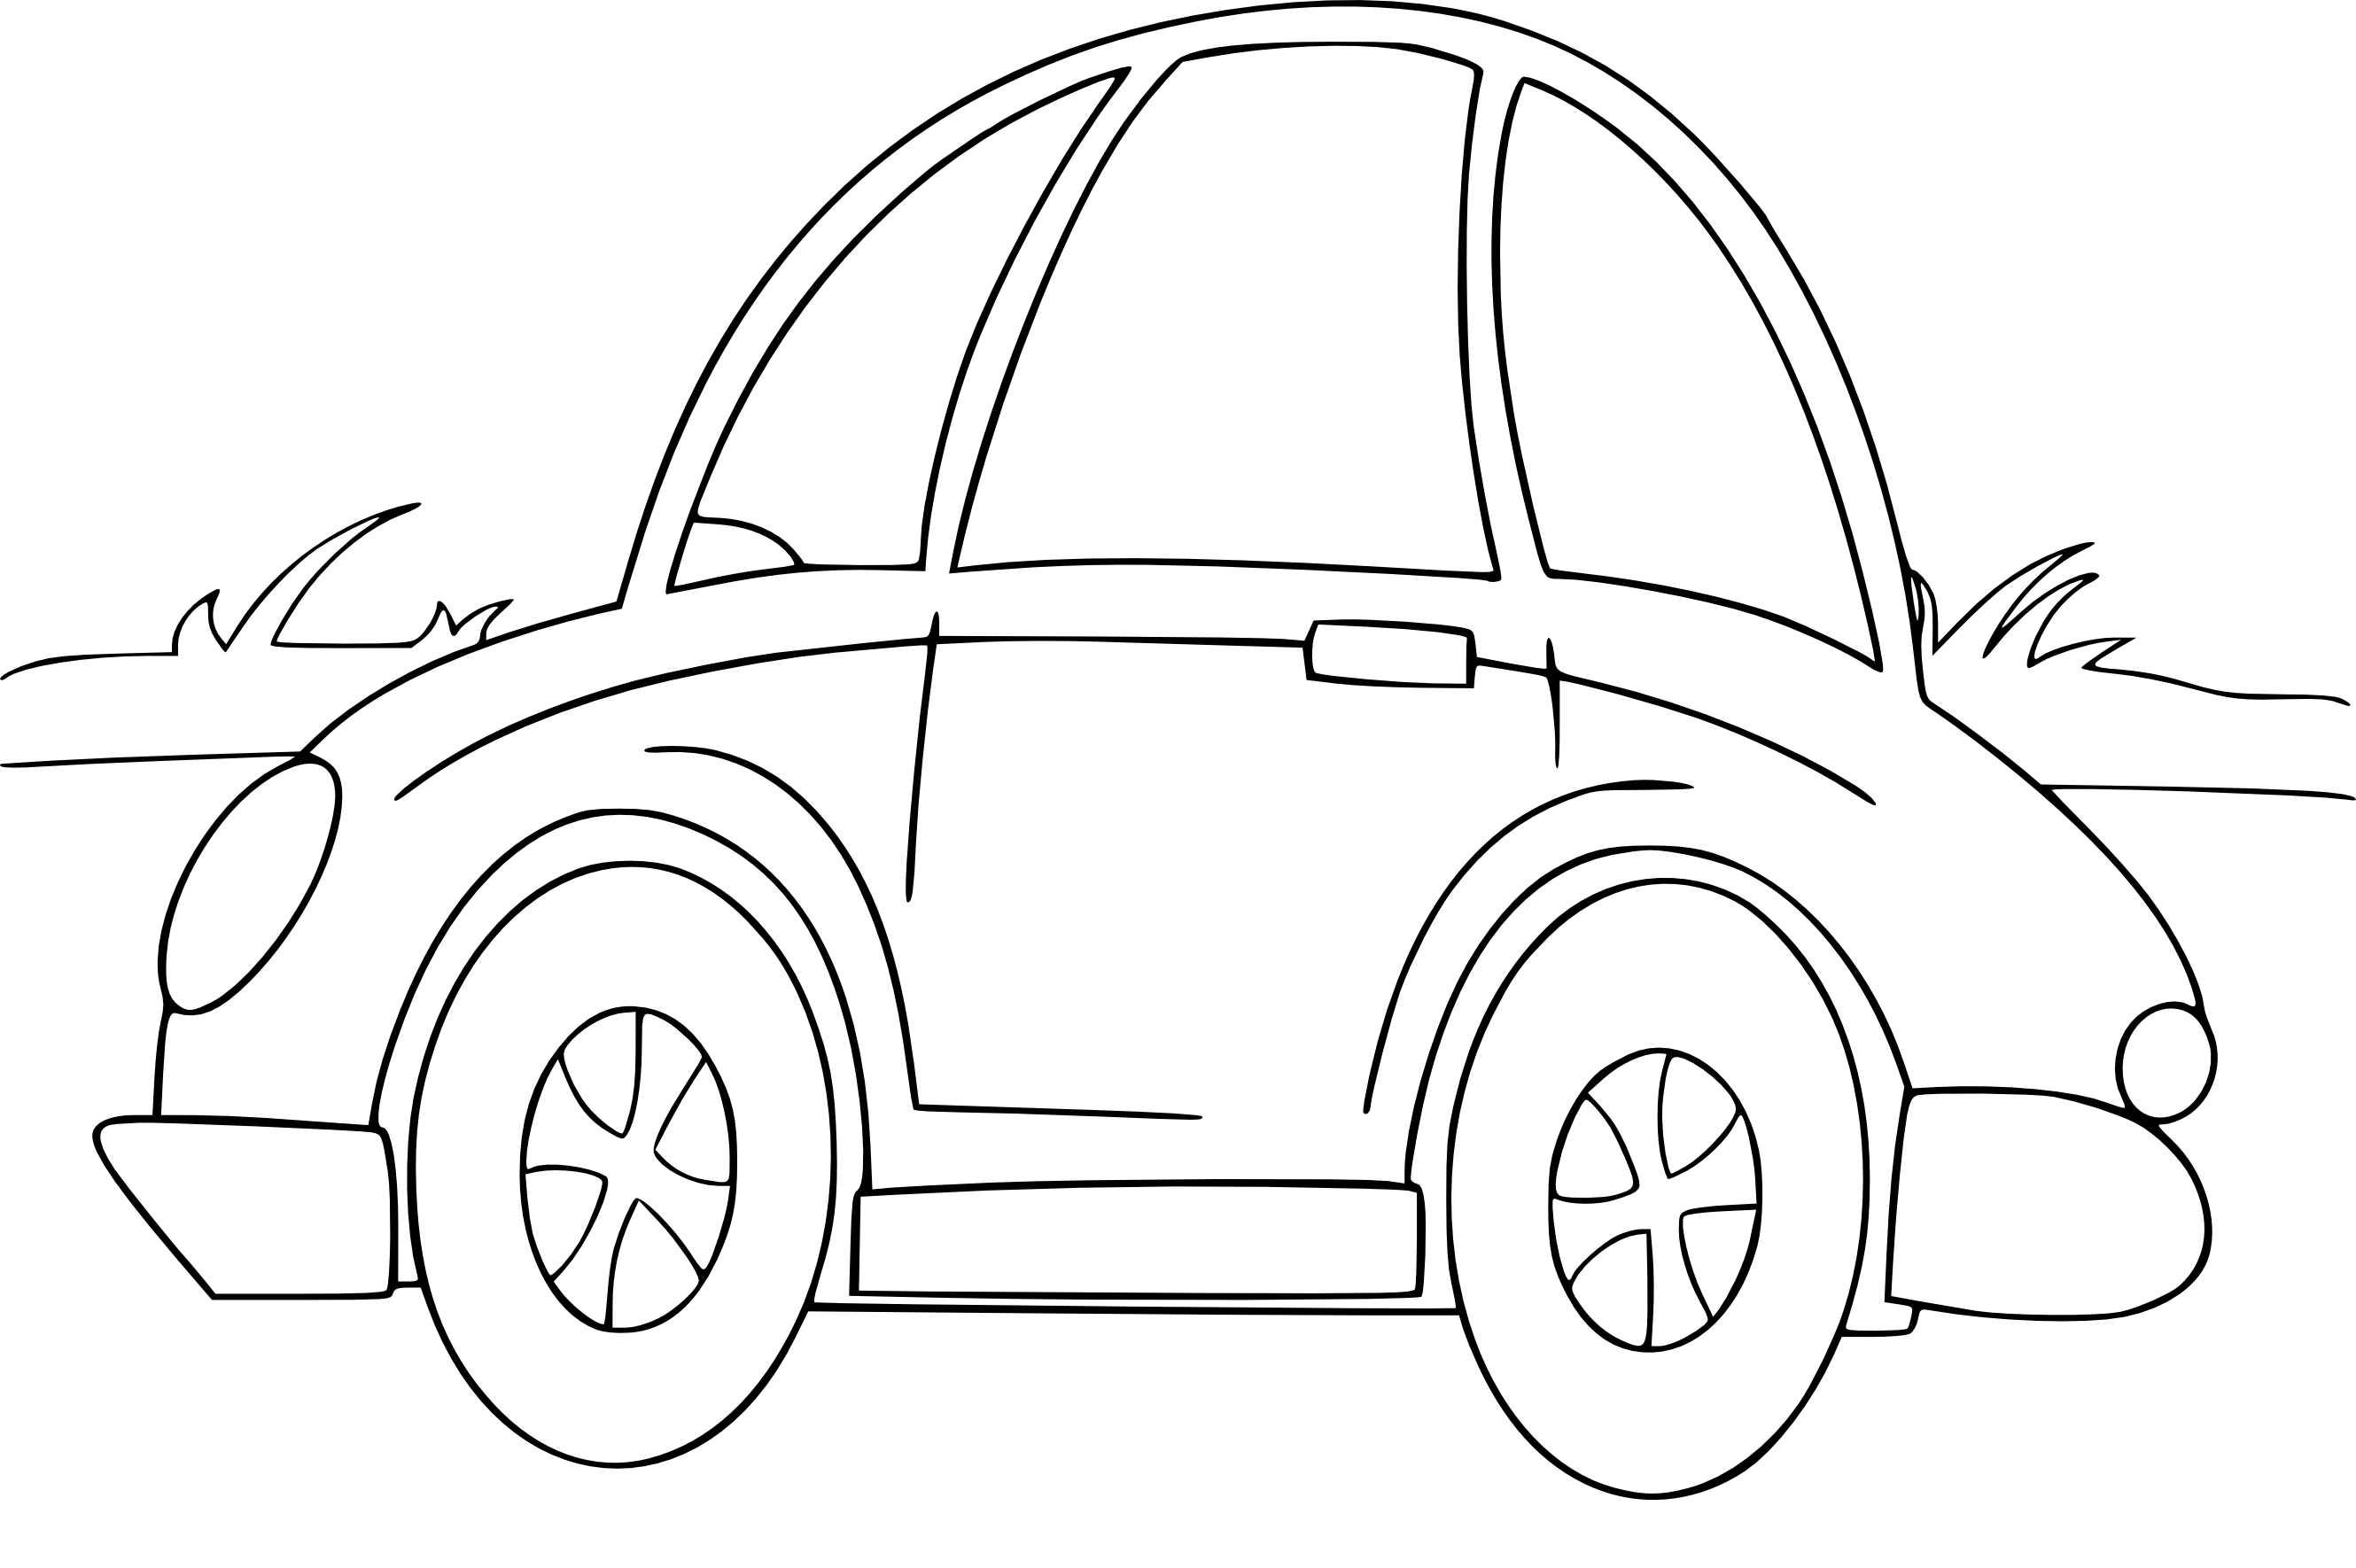 coloriage voiture enfant gratuit imprimer. Black Bedroom Furniture Sets. Home Design Ideas